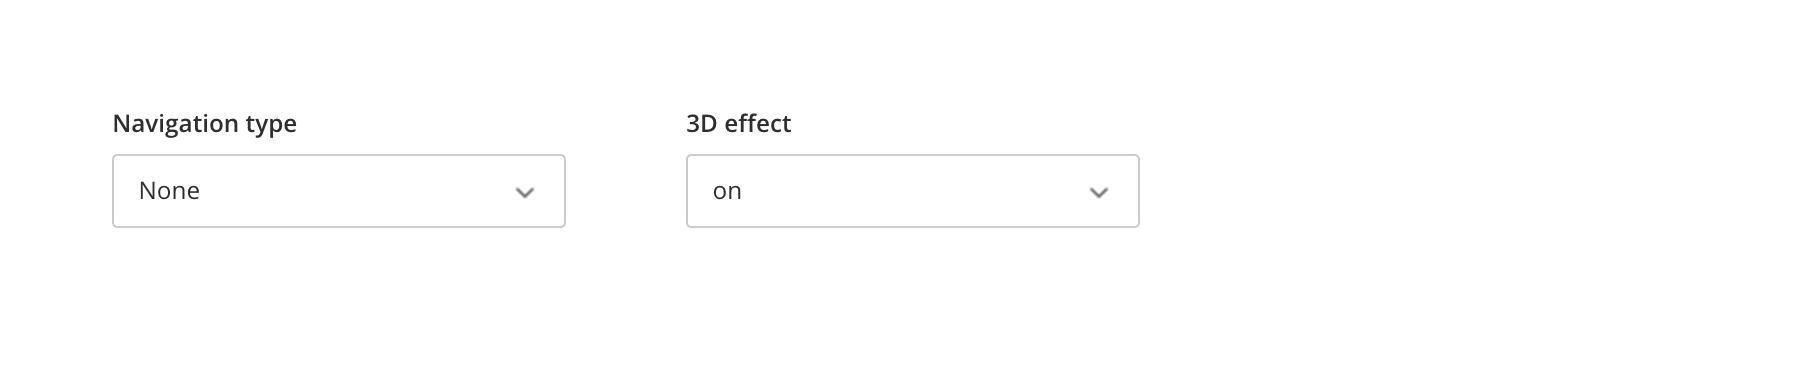 Navigation Effect